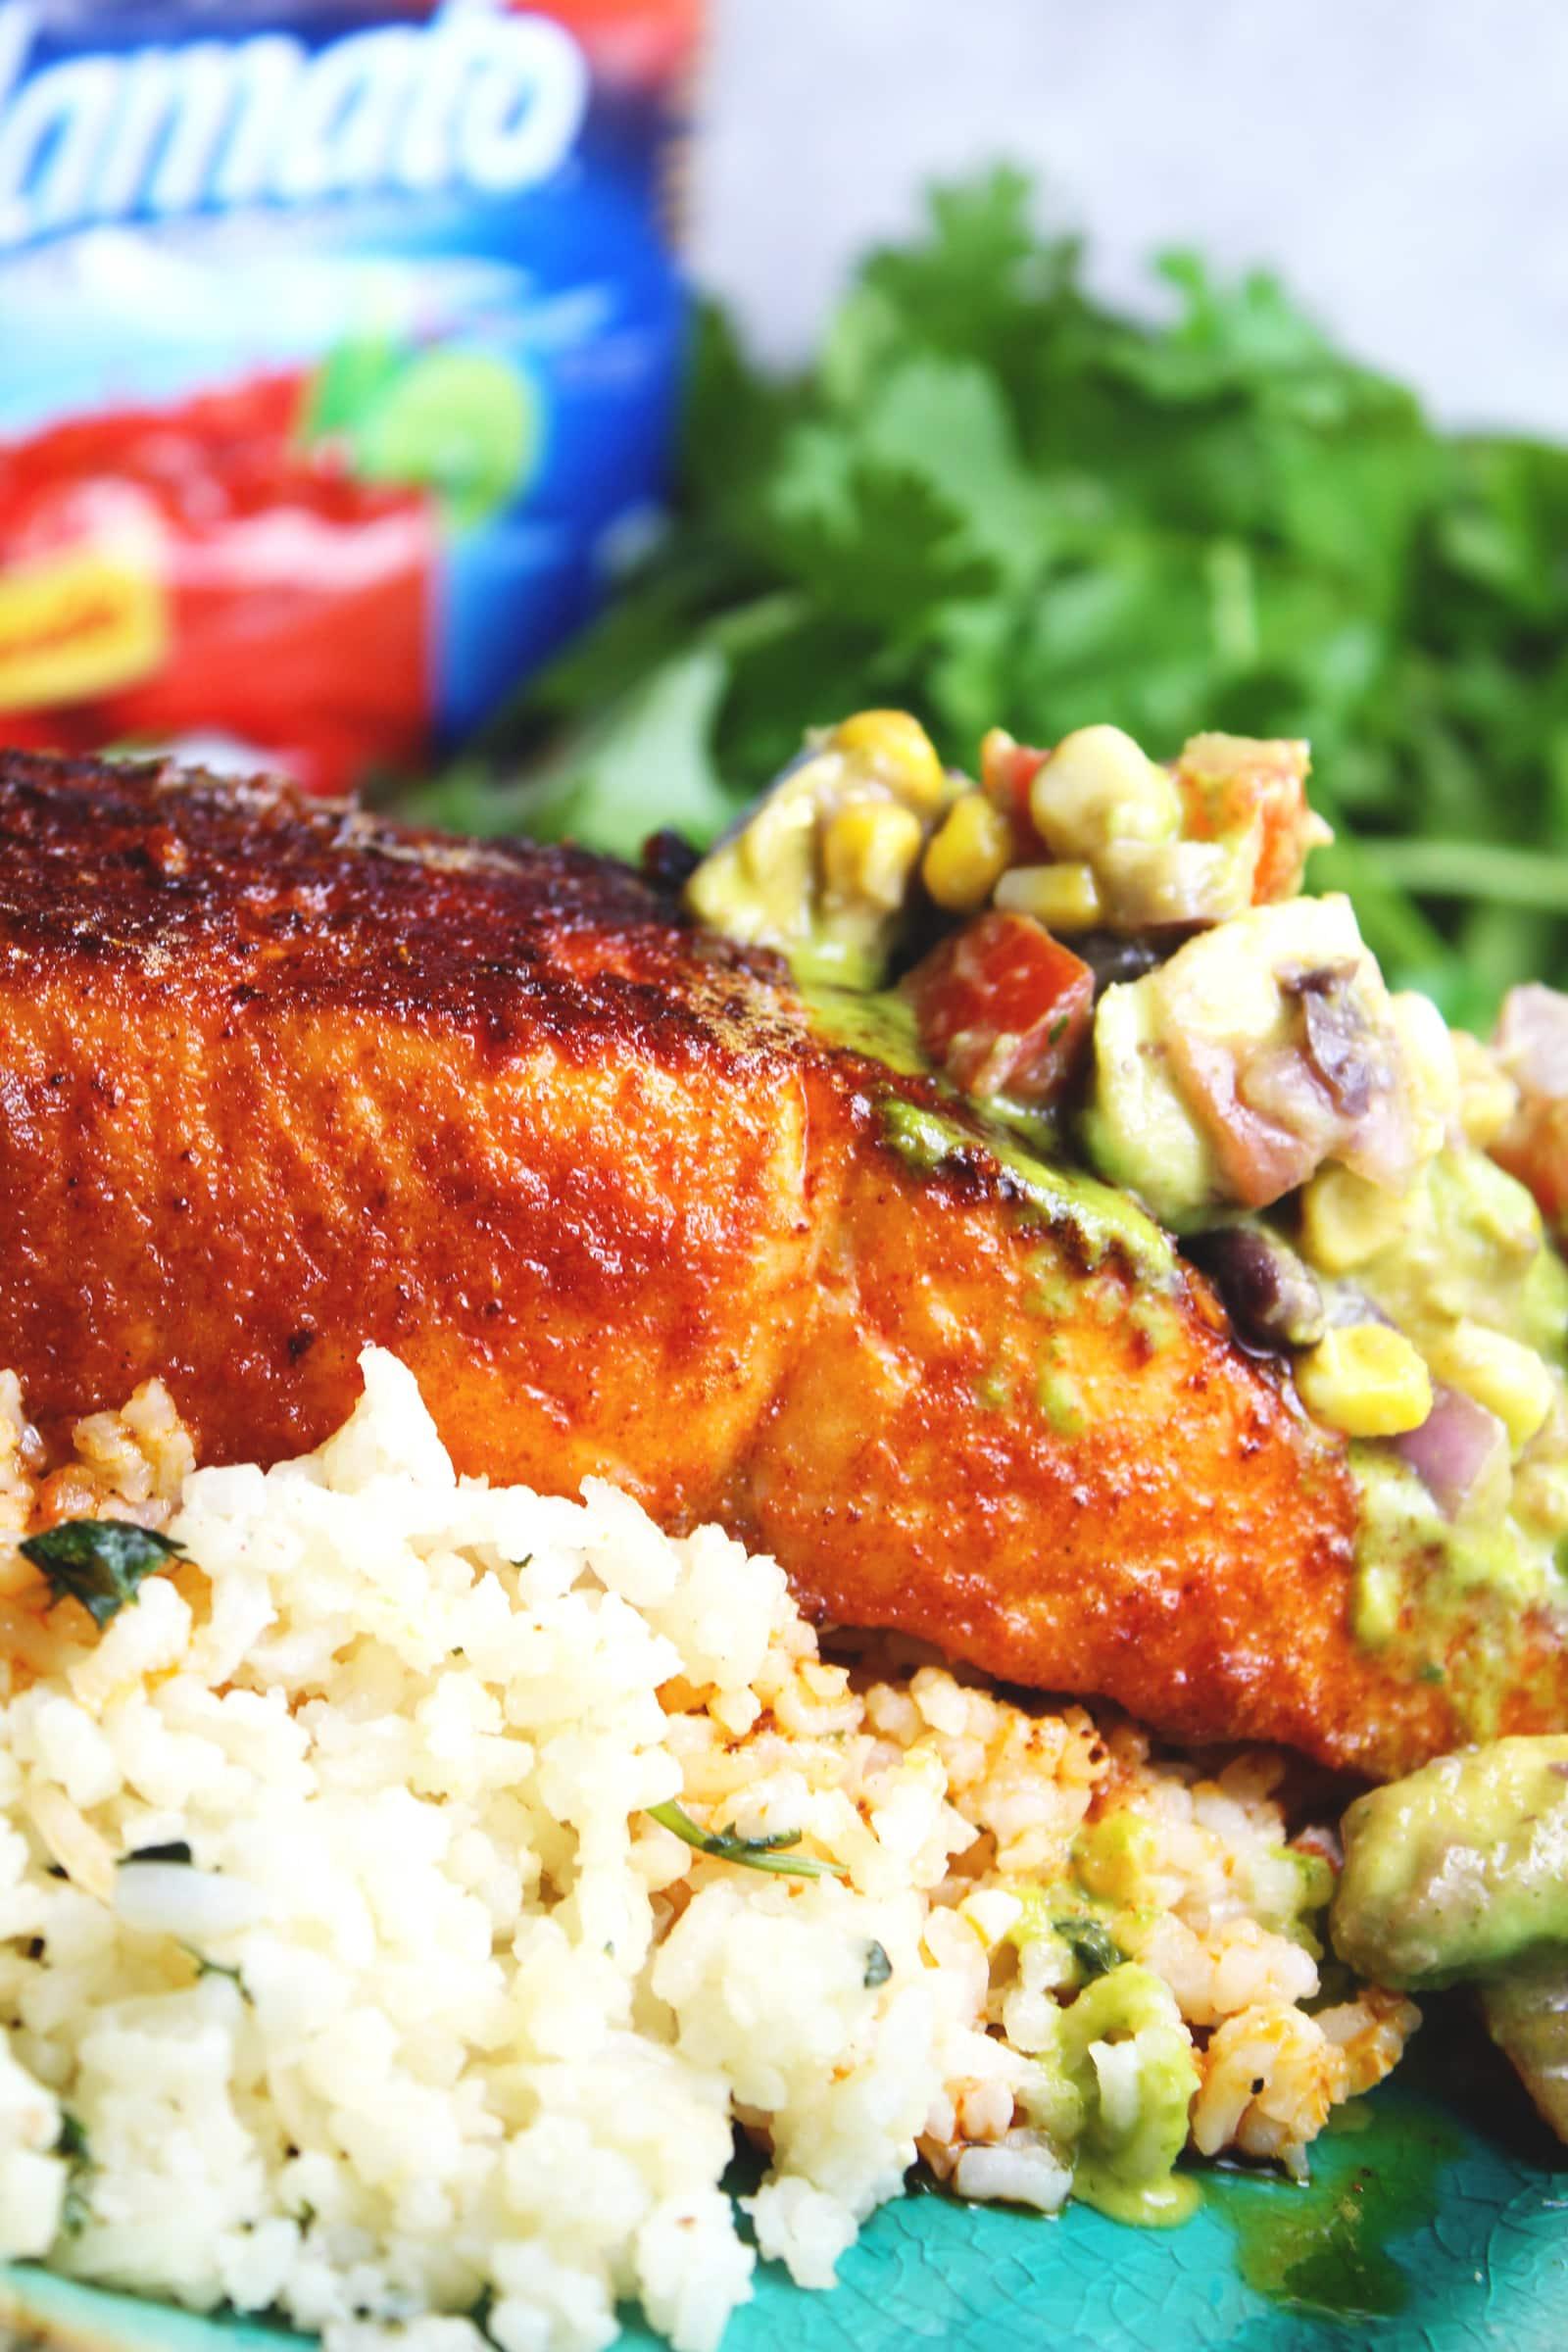 @biculturalfamilia's cover photo for 'Spicy Salmon with Cilantro Lime Rice & Avocado Black Bean Salsa'